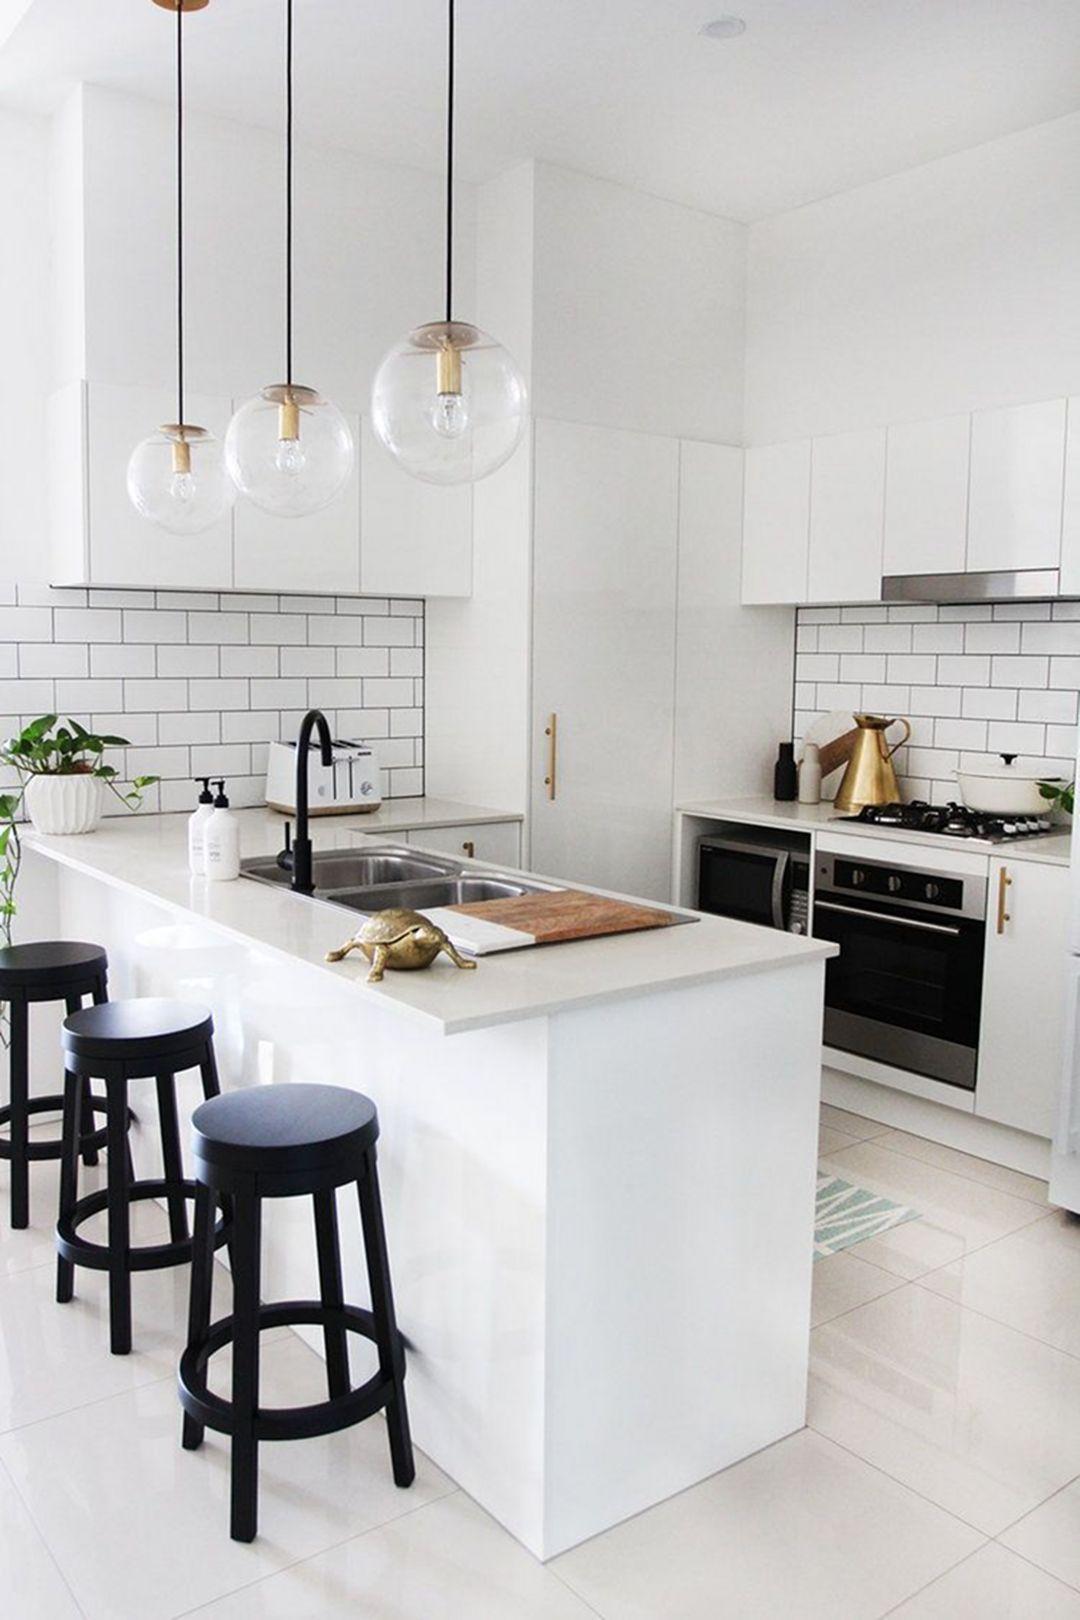 Best 10 Elegant White Kitchen Design Ideas For More Comfortable 400 x 300